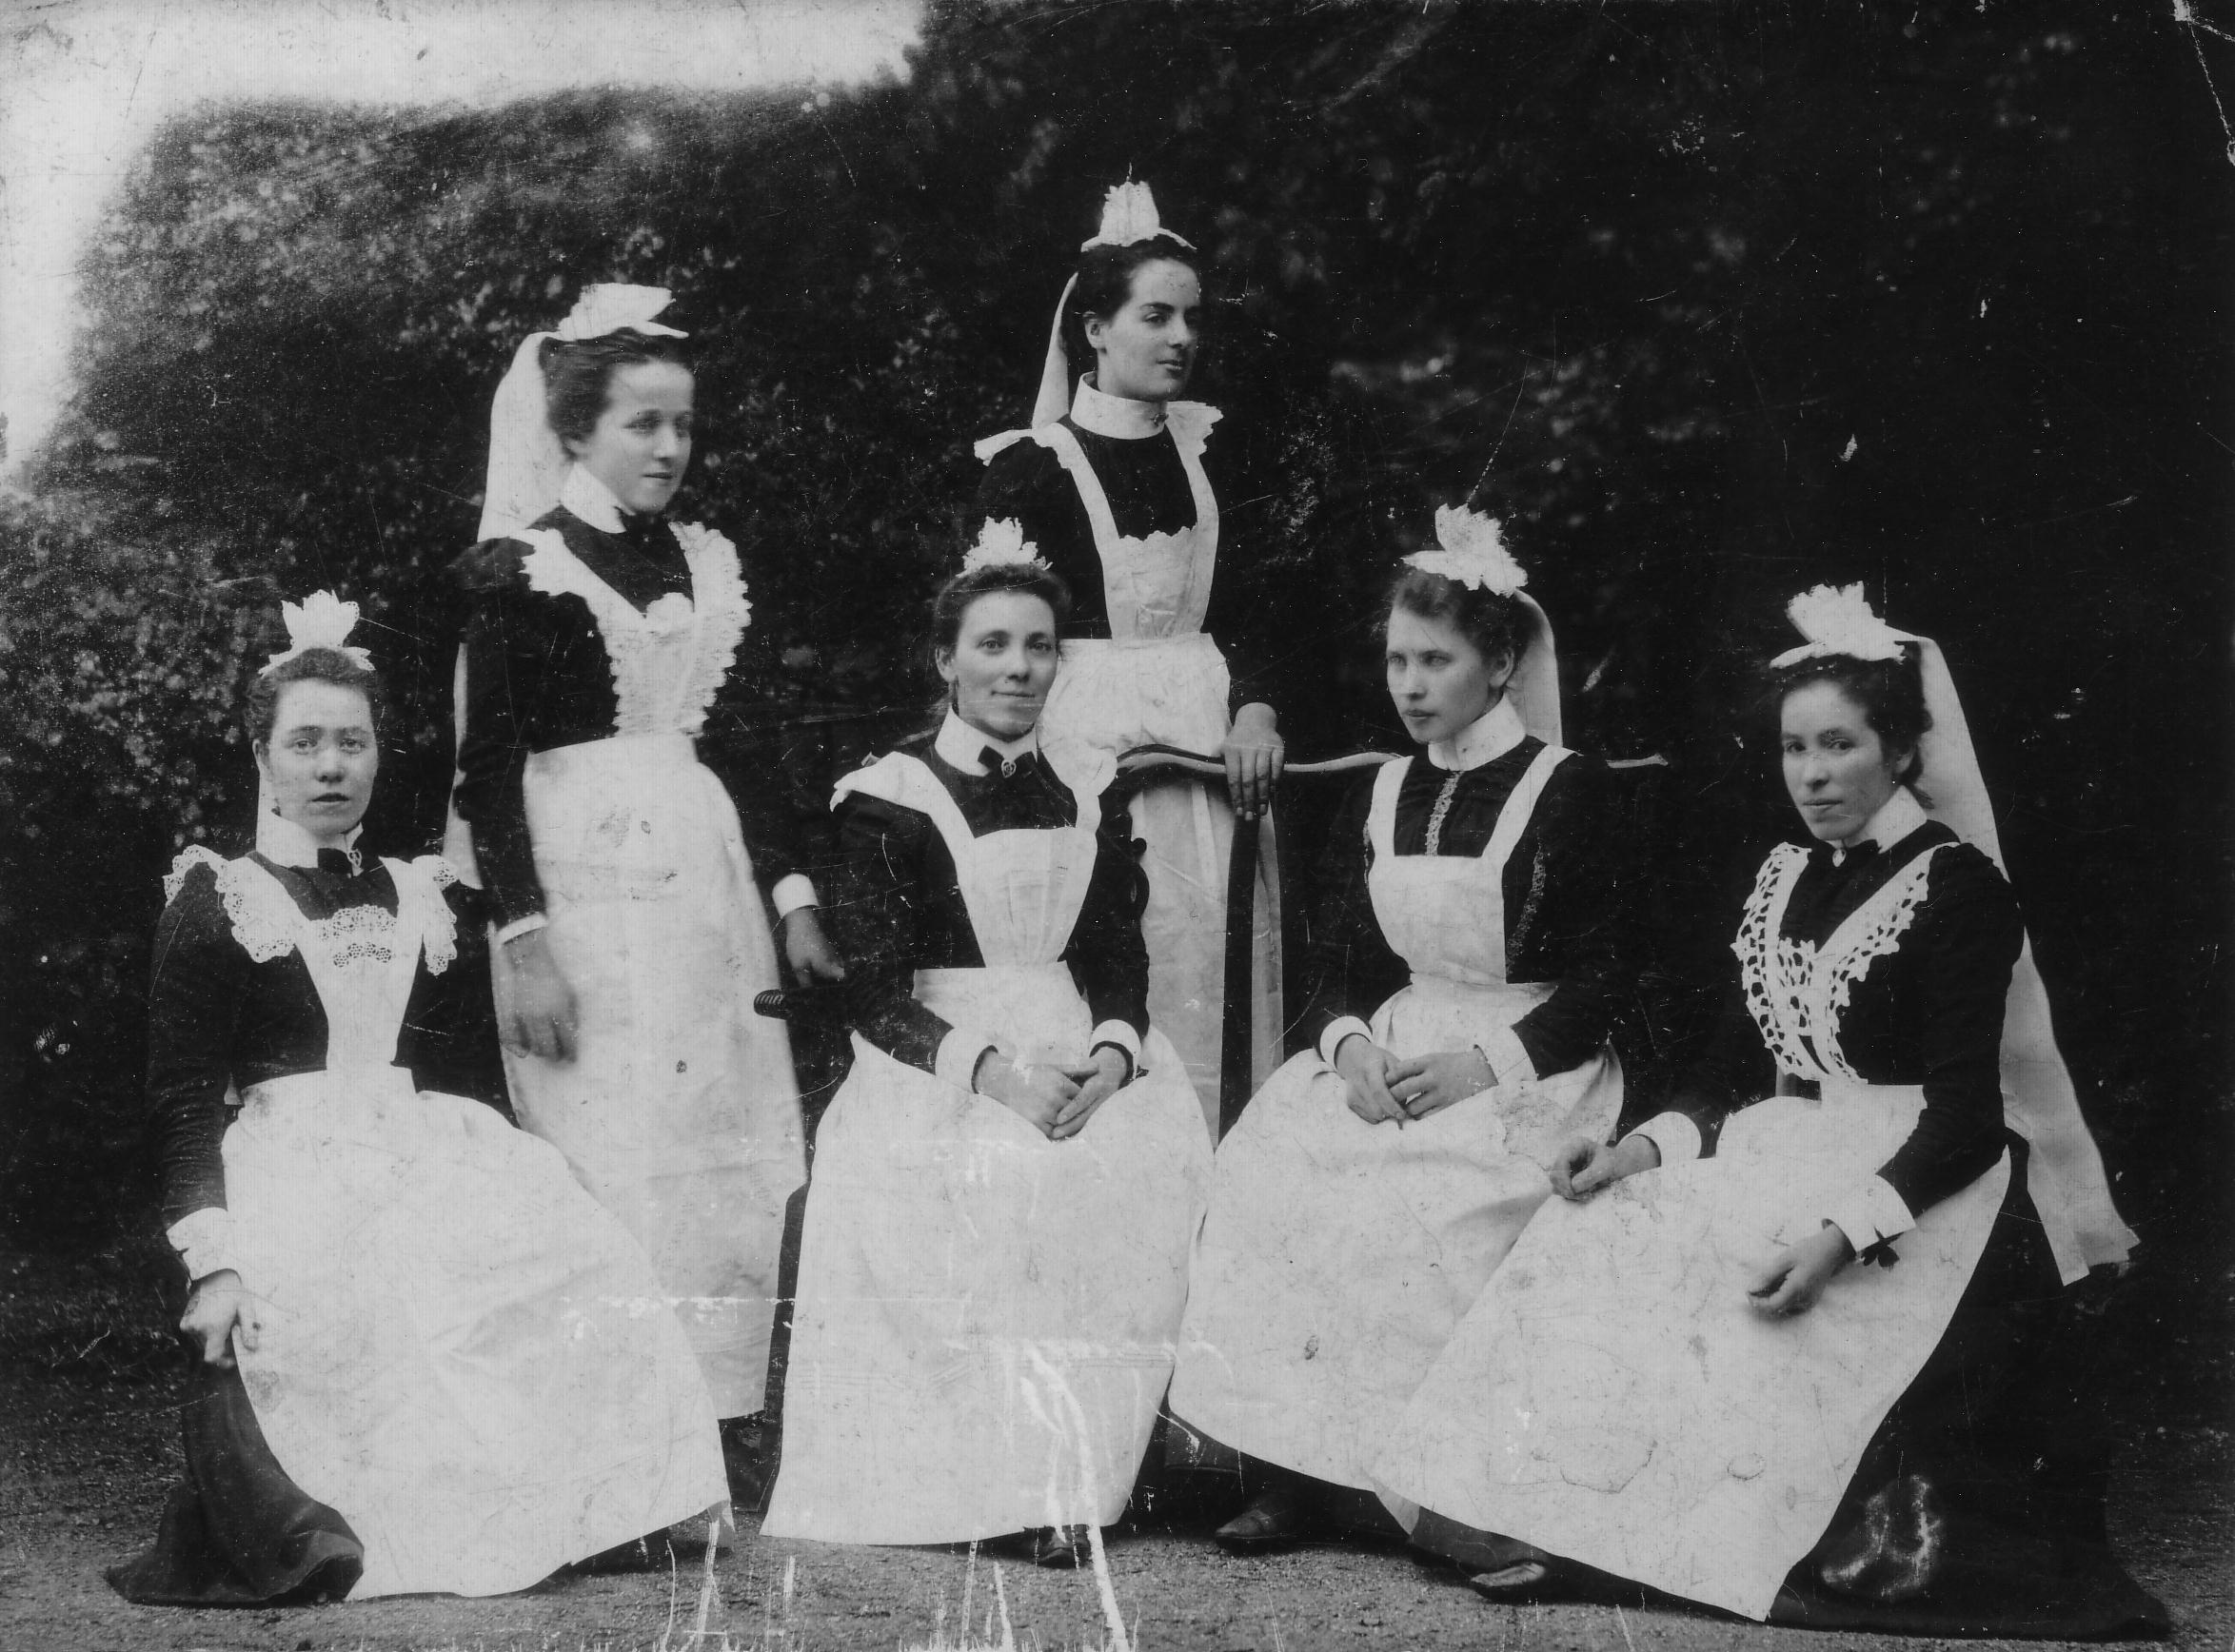 Maid Servants 1900s